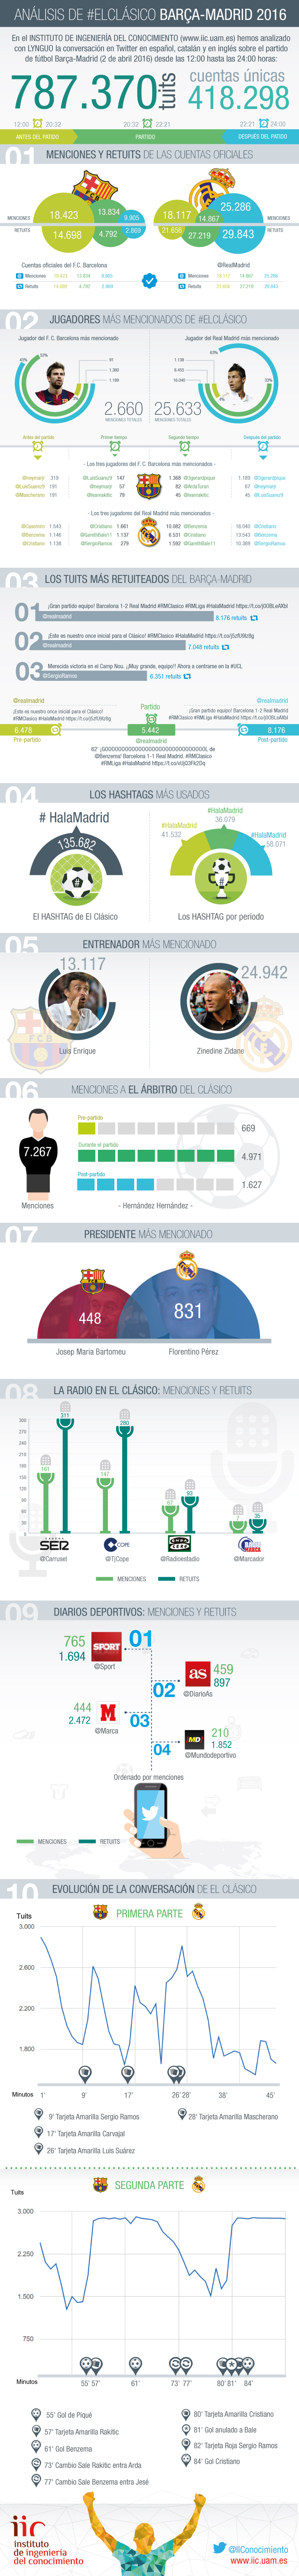 Análisis del partido Barcelona-Real Madrid 2016 en Twitter